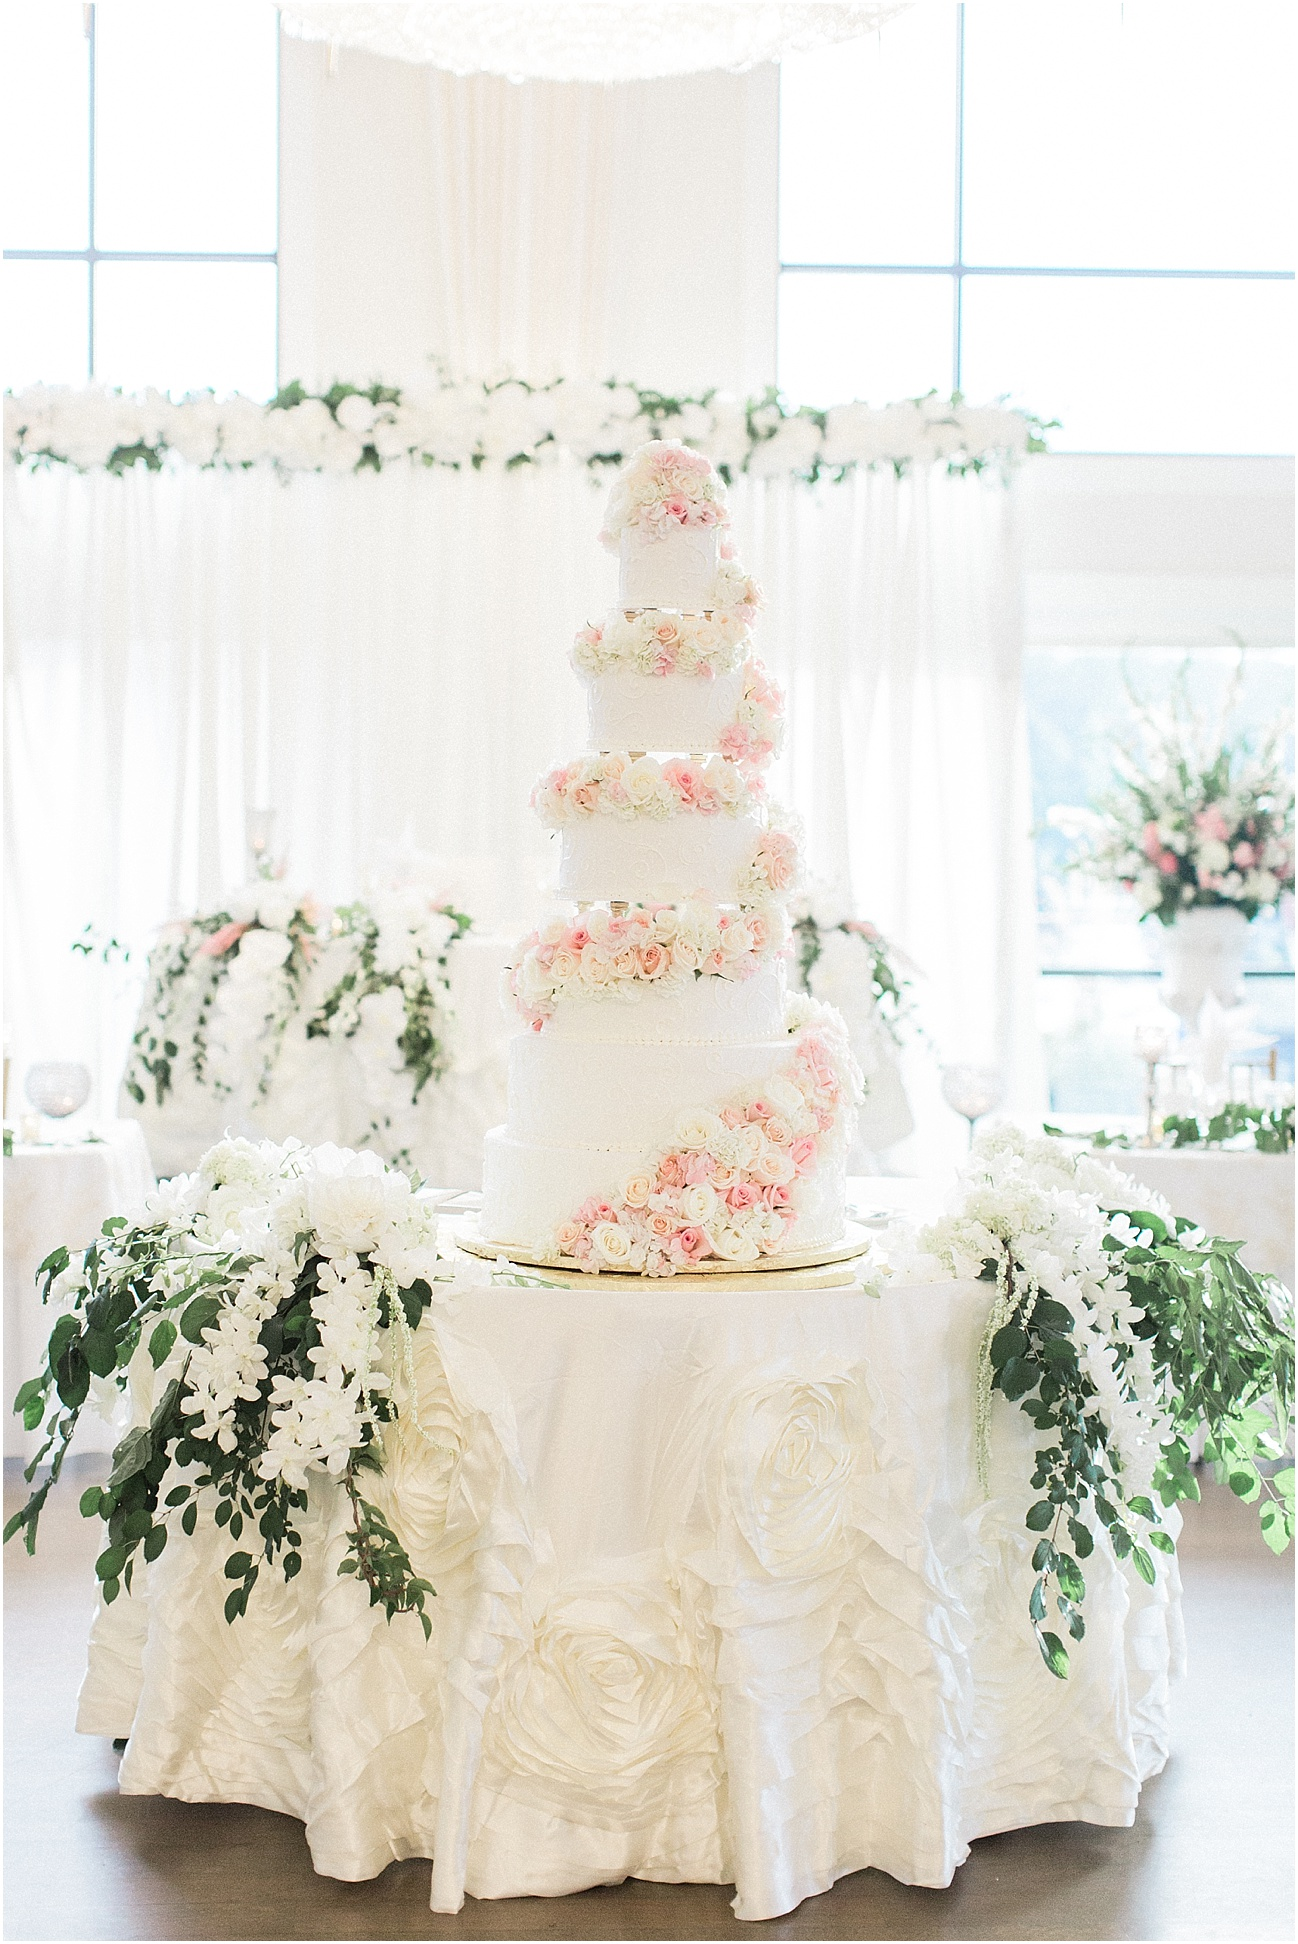 bianca_chris_danversport_italian_blush_gold_north_shore_cape_cod_boston_wedding_photographer_meredith_jane_photography_photo_1148.jpg